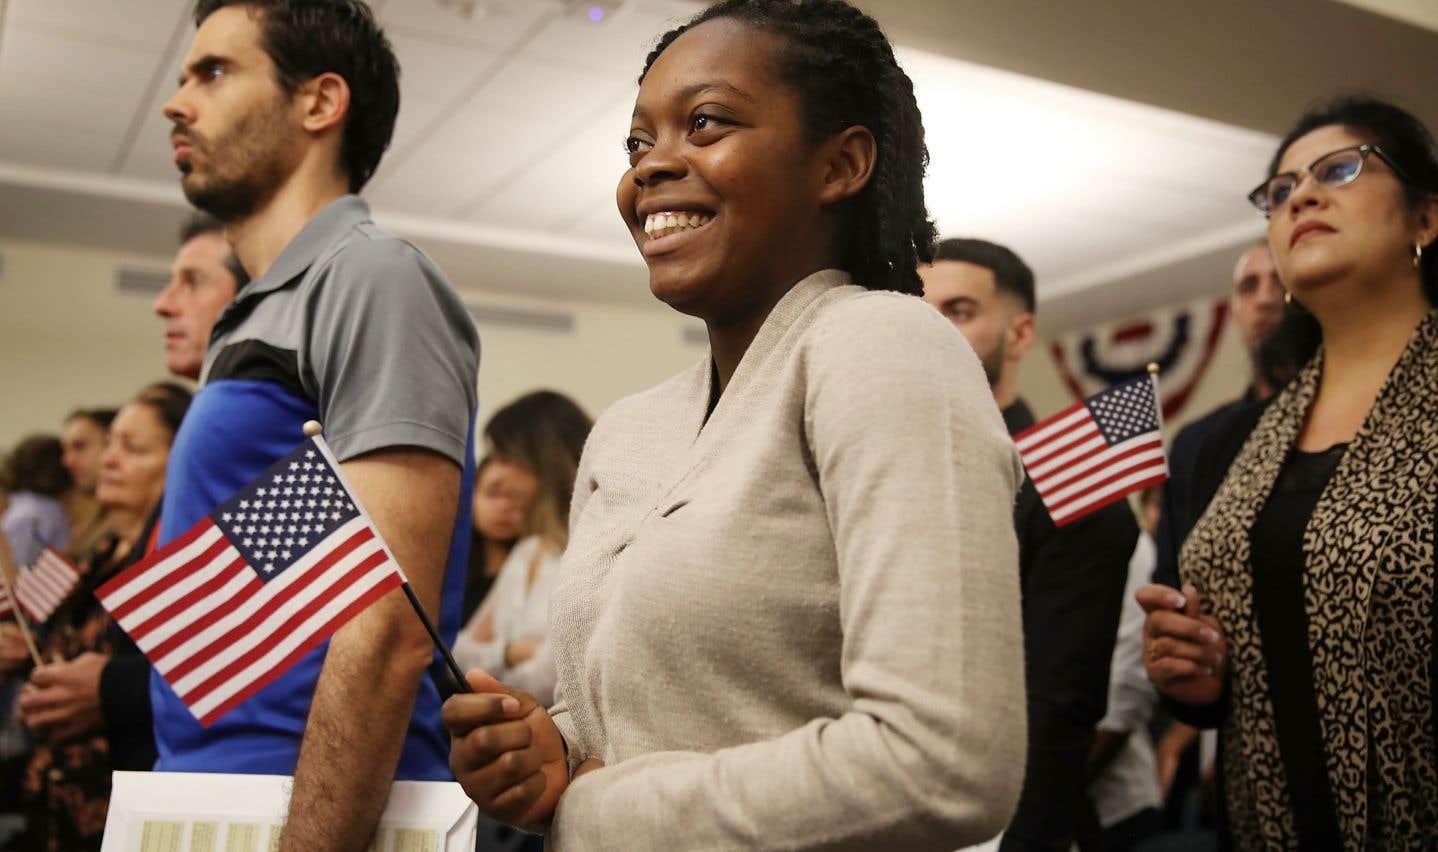 Les immigrants norvégiens dont rêve Trump viennent aujourd'hui d'Haïti